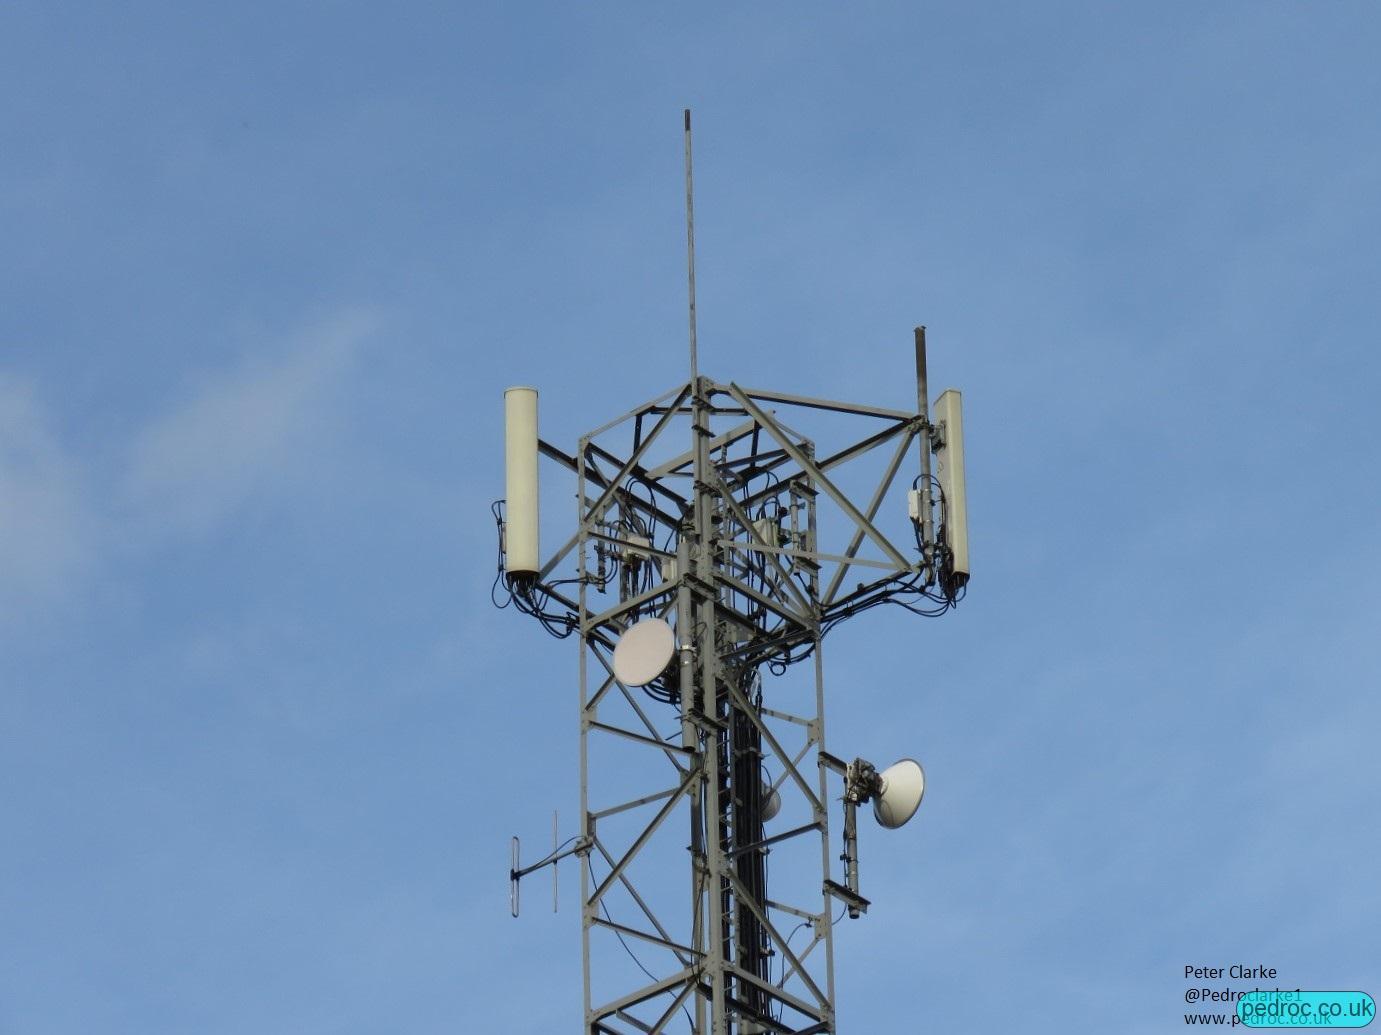 Closeup Commscope antennas for EE/3 on the West Beckham mast.